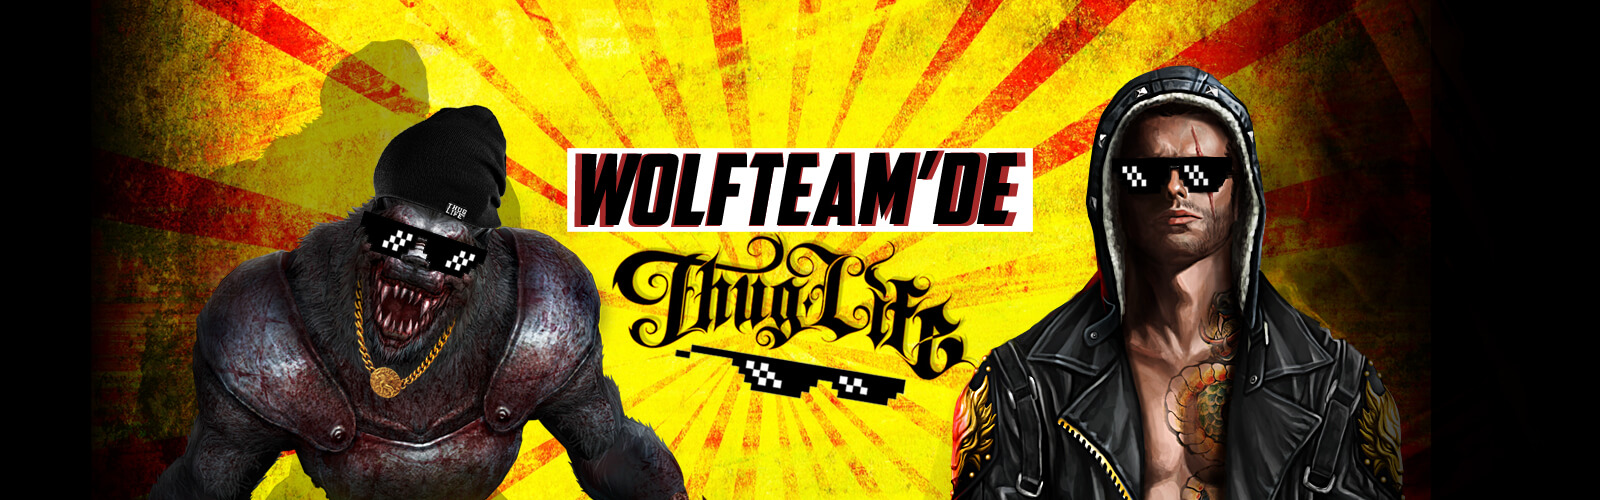 Wolfteam Thug Life